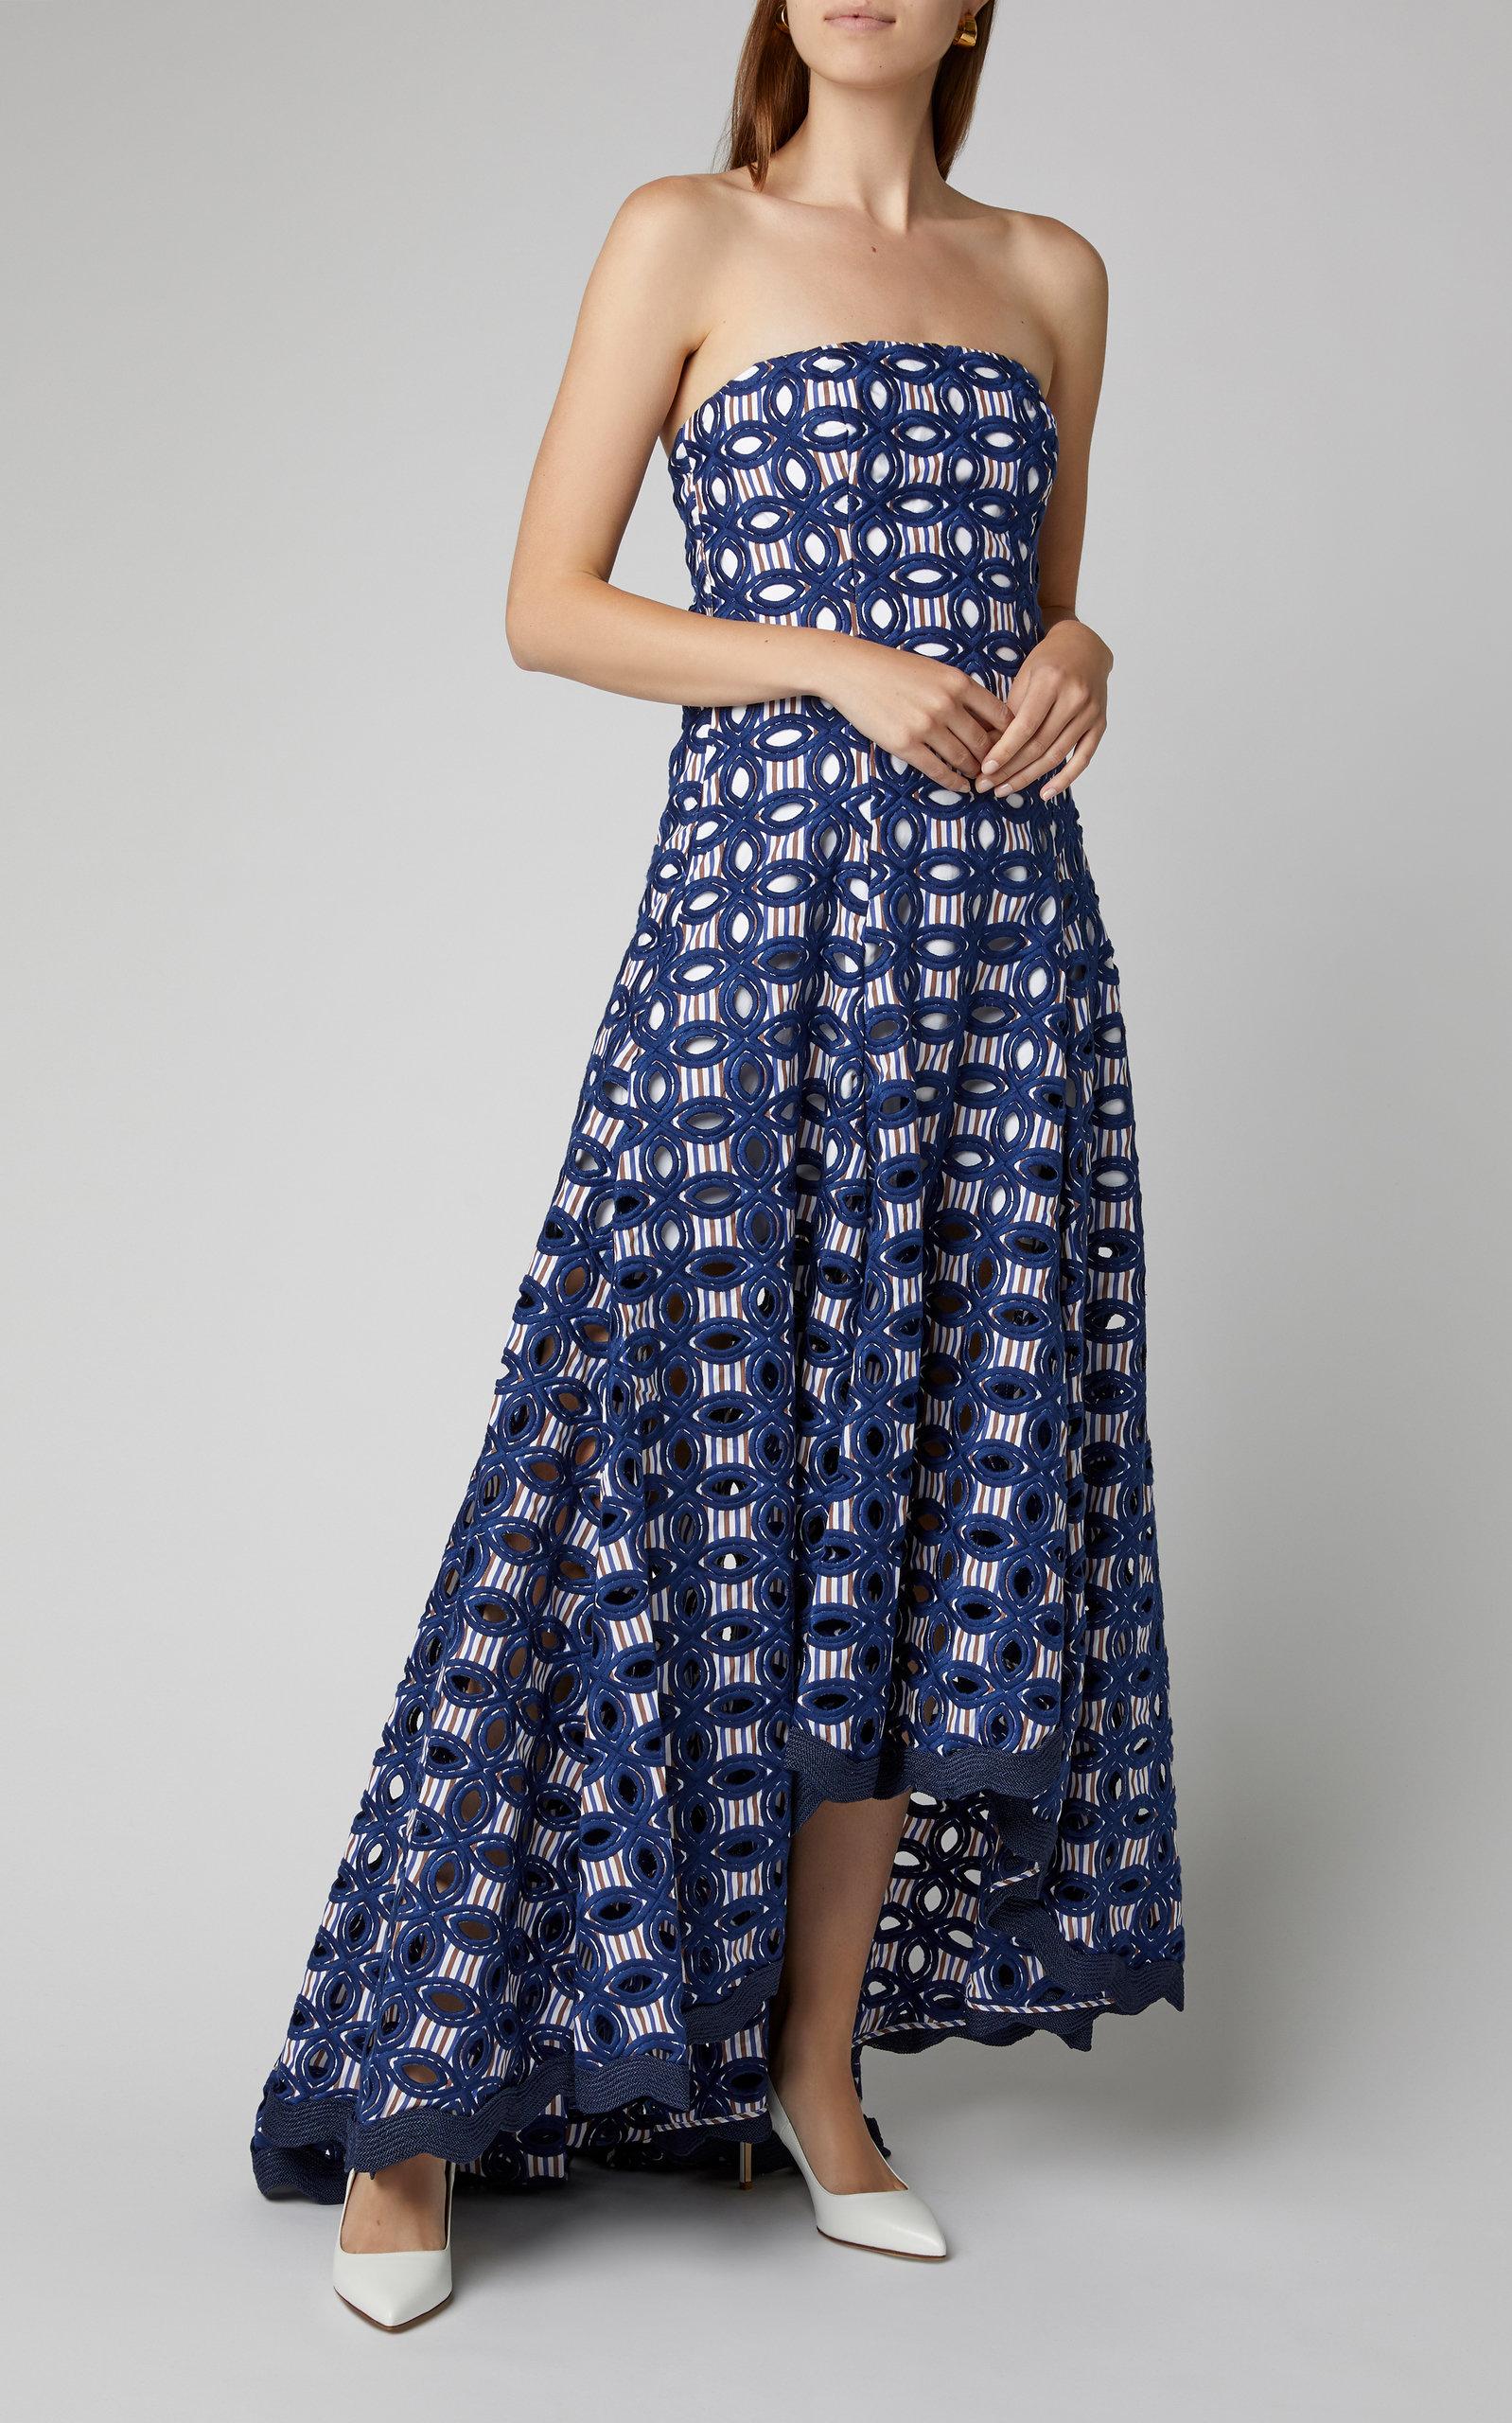 Alexis Dresses Antoni Broderie Anglaise Crepe De Chine Maxi Dress